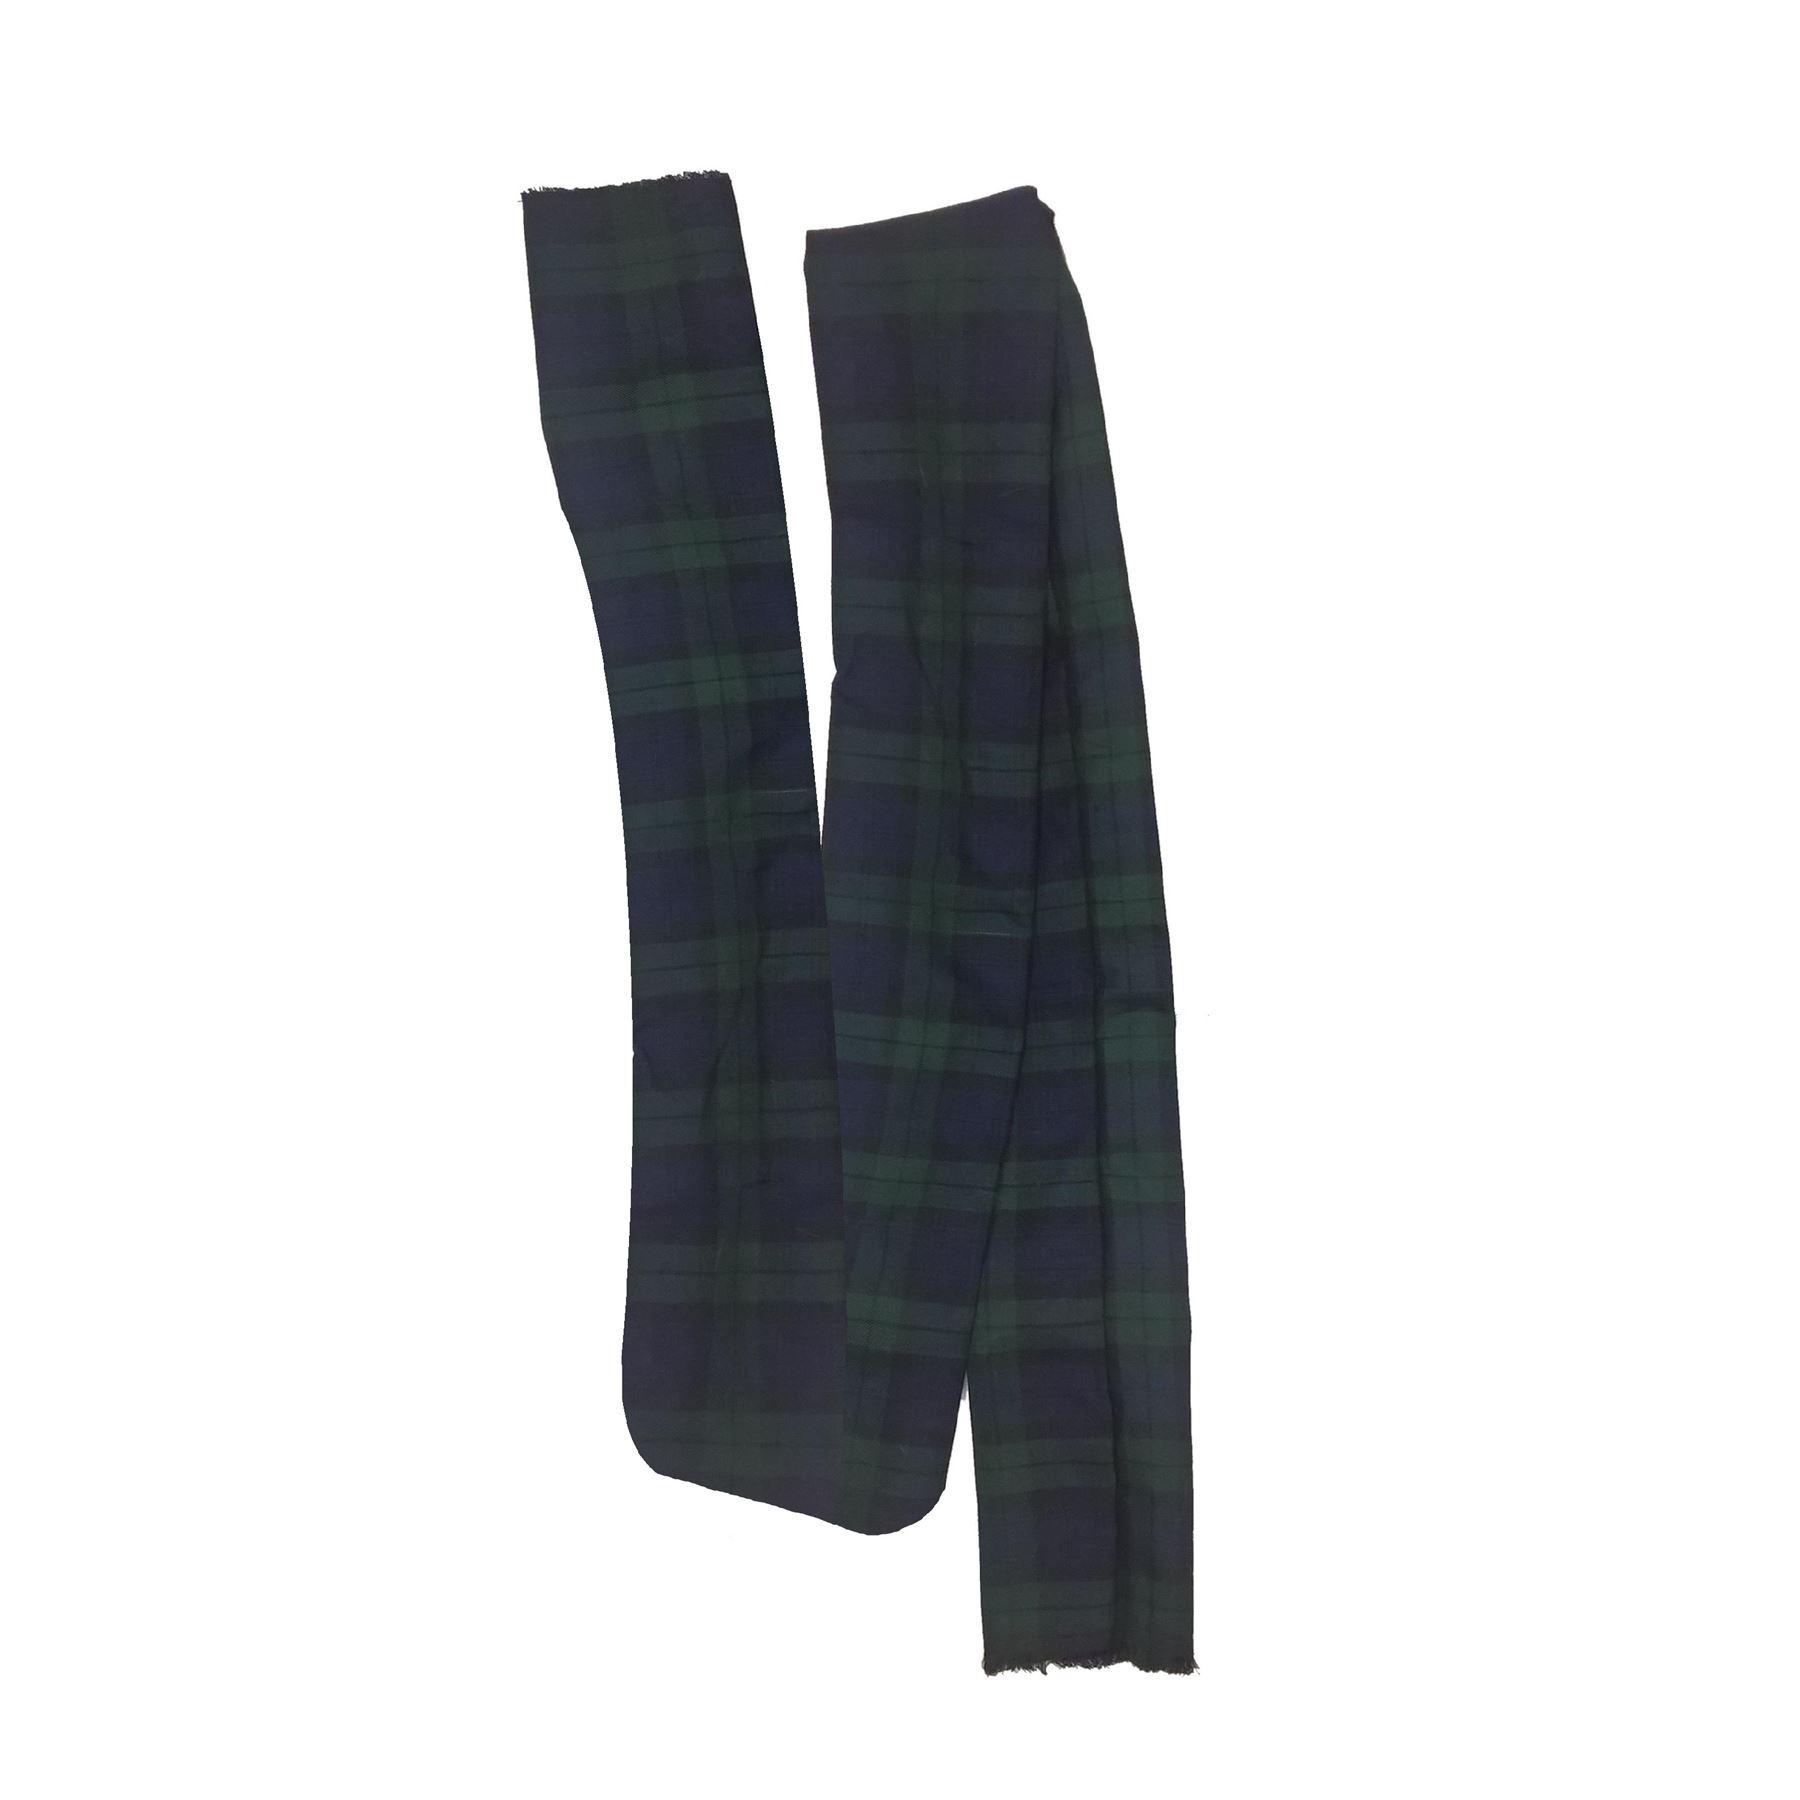 6ft-Scottish-Commonwealth-Red-Black-Blue-Tartan-Sash-Burns-Night-Fancy-Dress